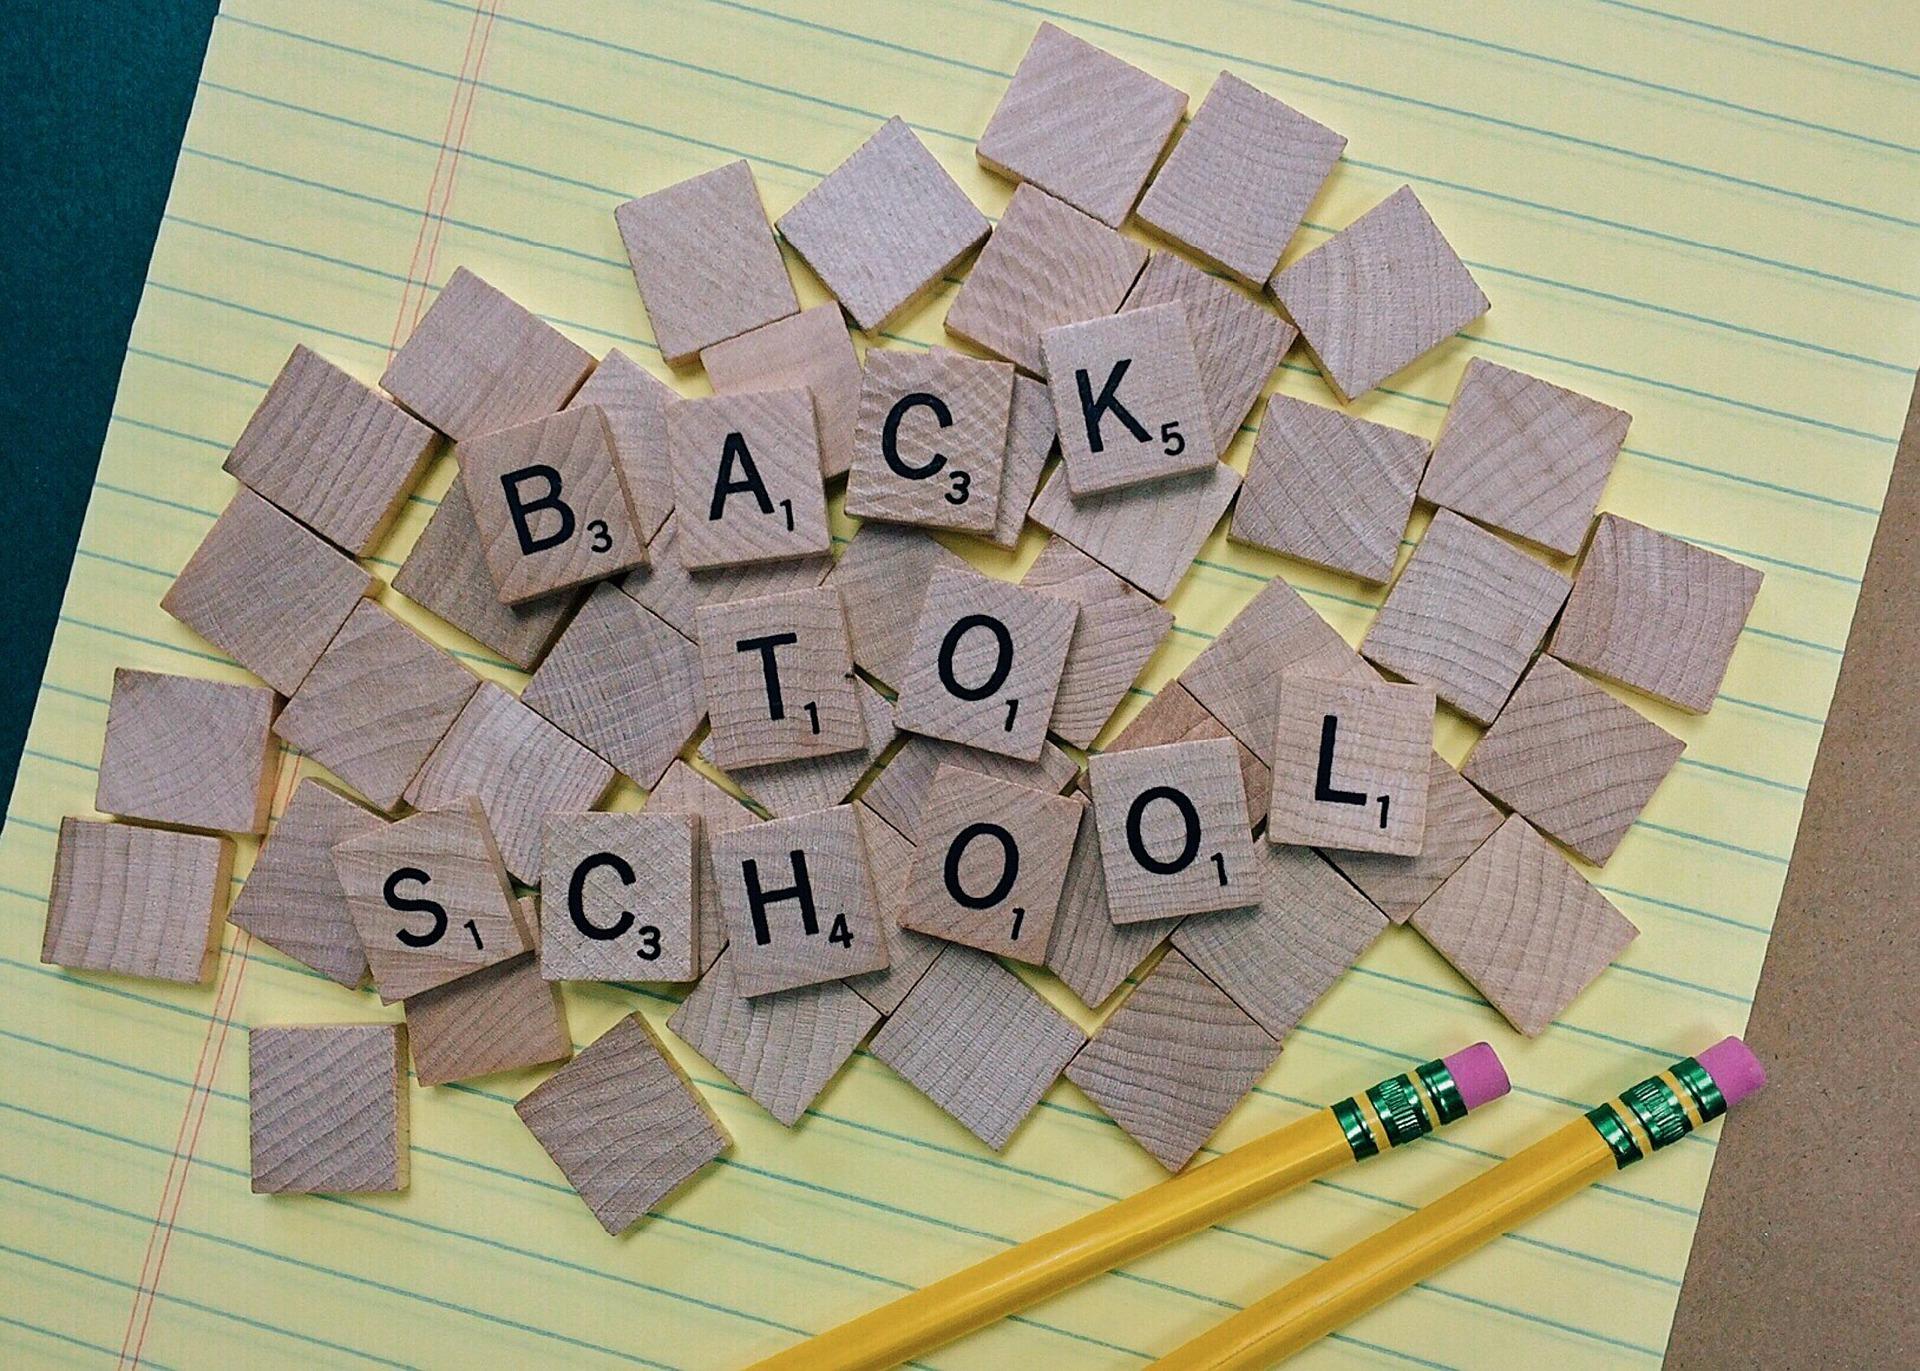 It's back to school for teachers!